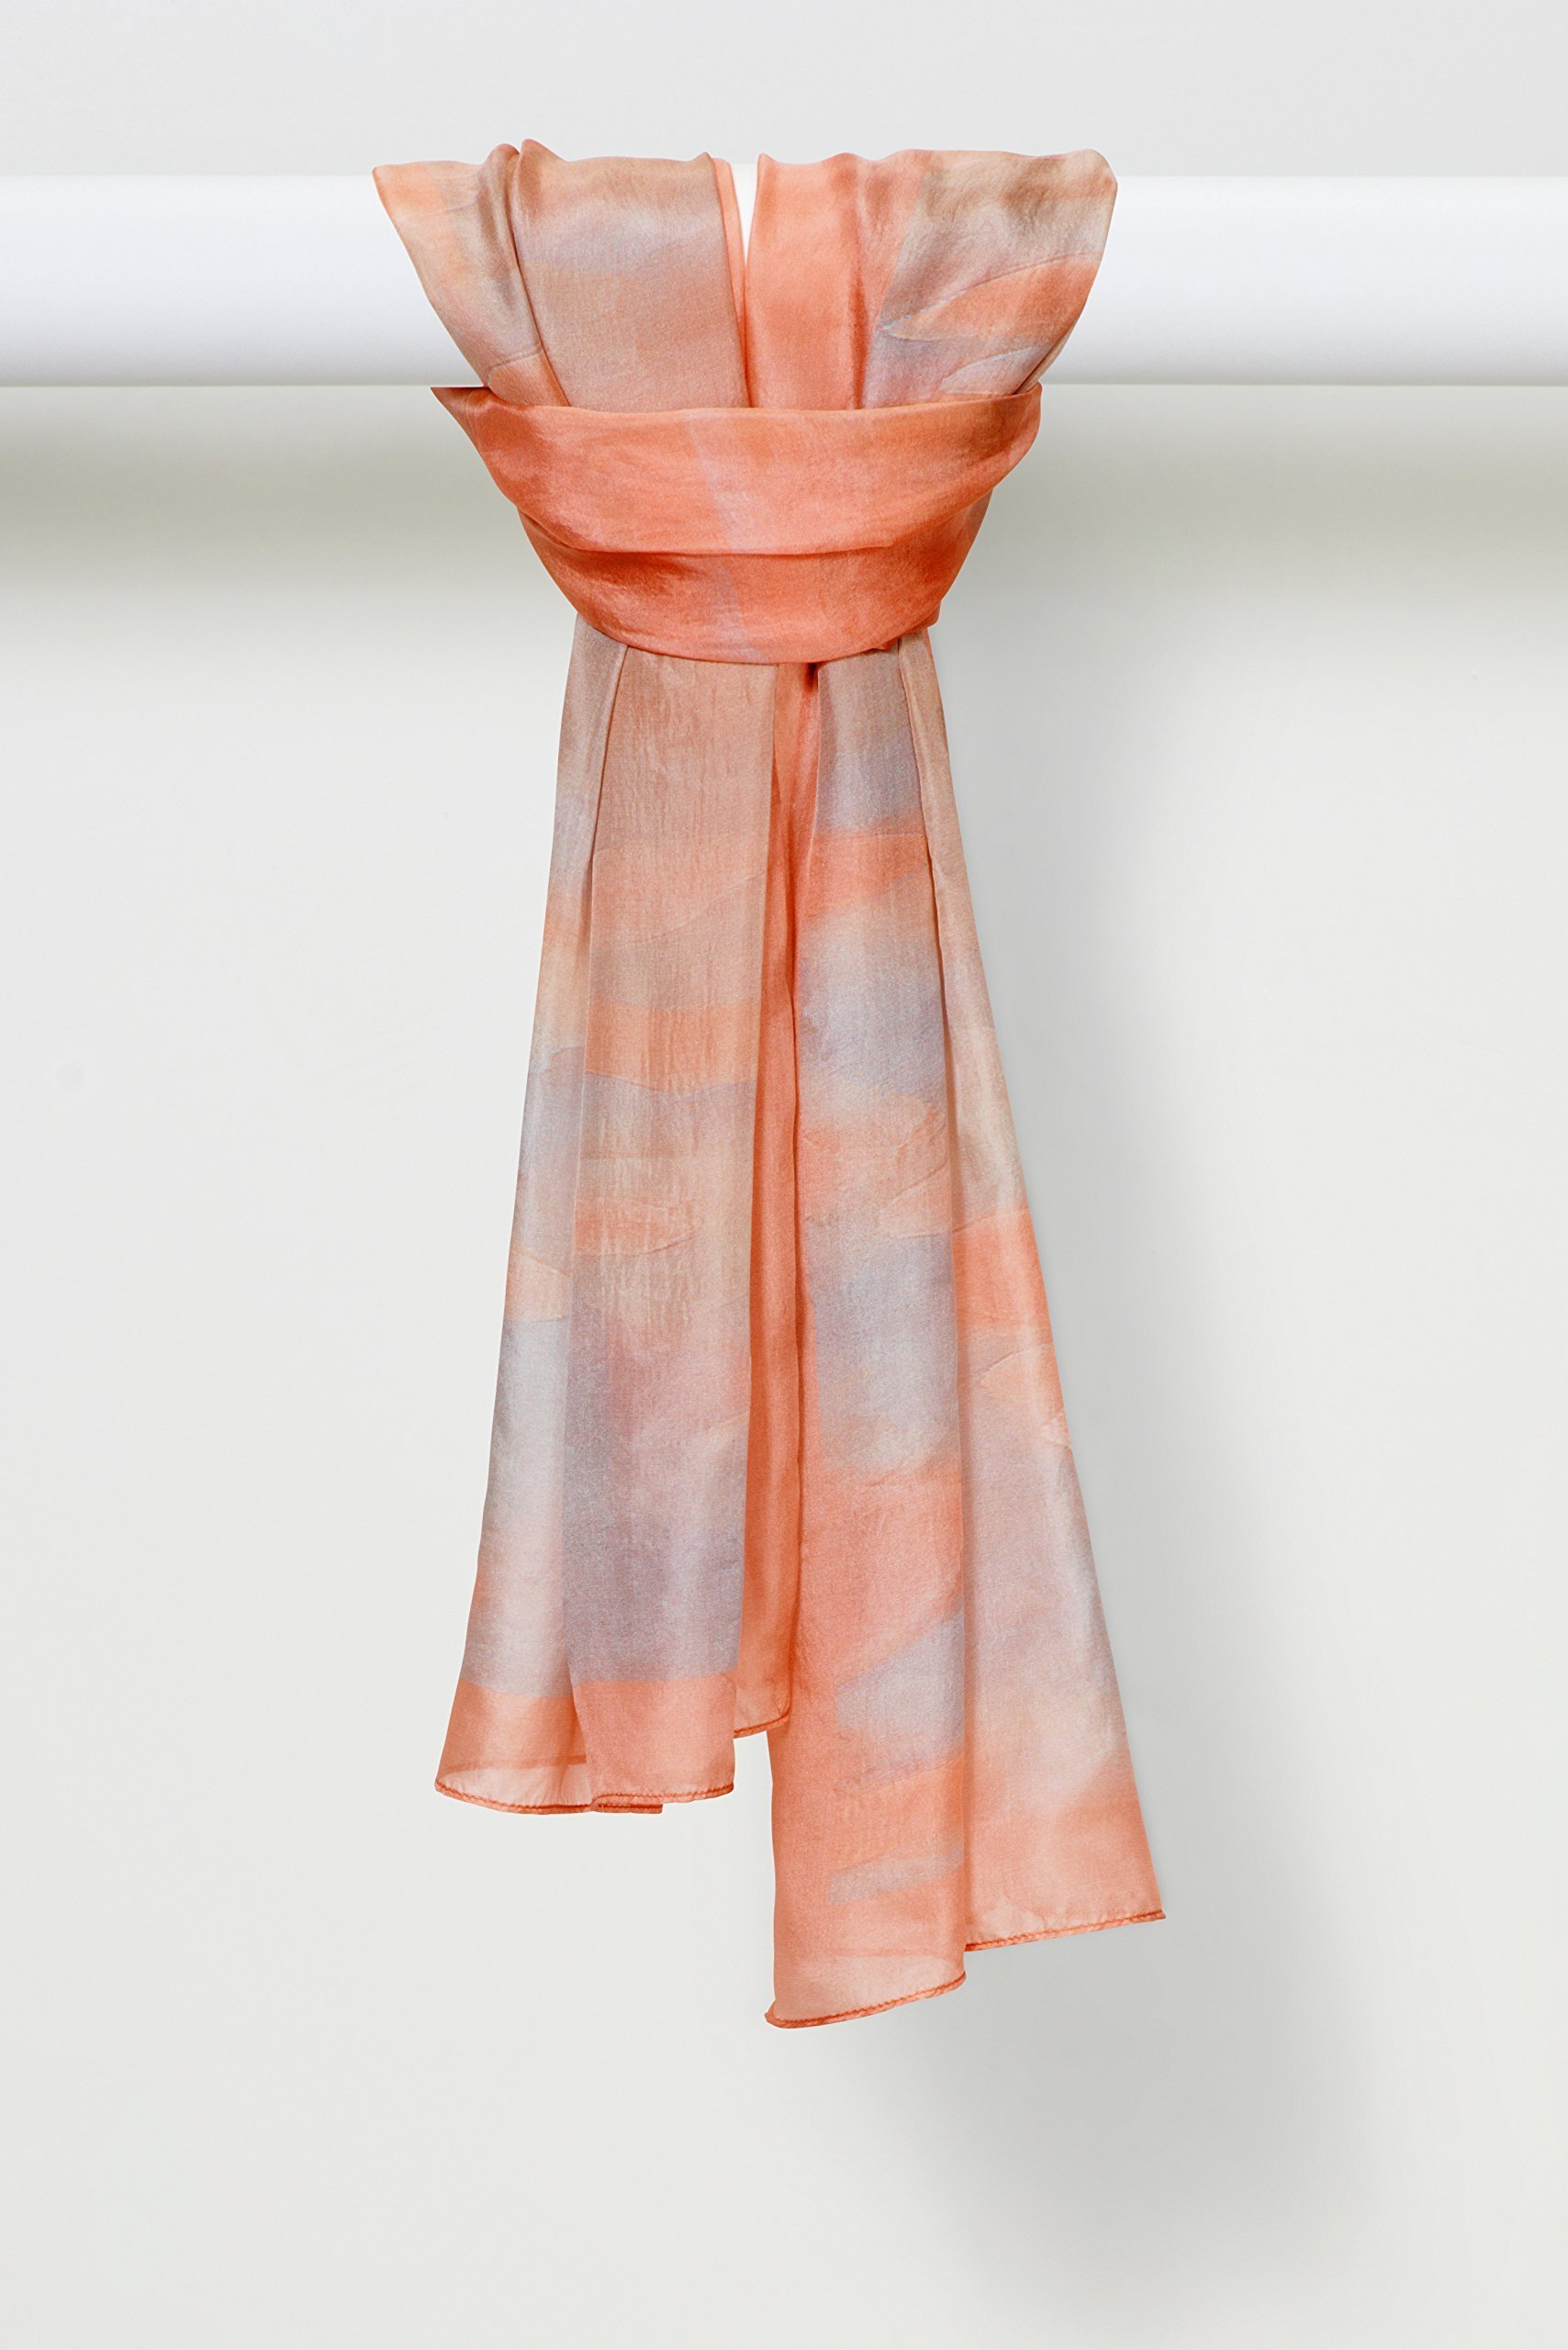 Louis Jane Watercolors Smooth Silk Chiffon Scarf in Peaches